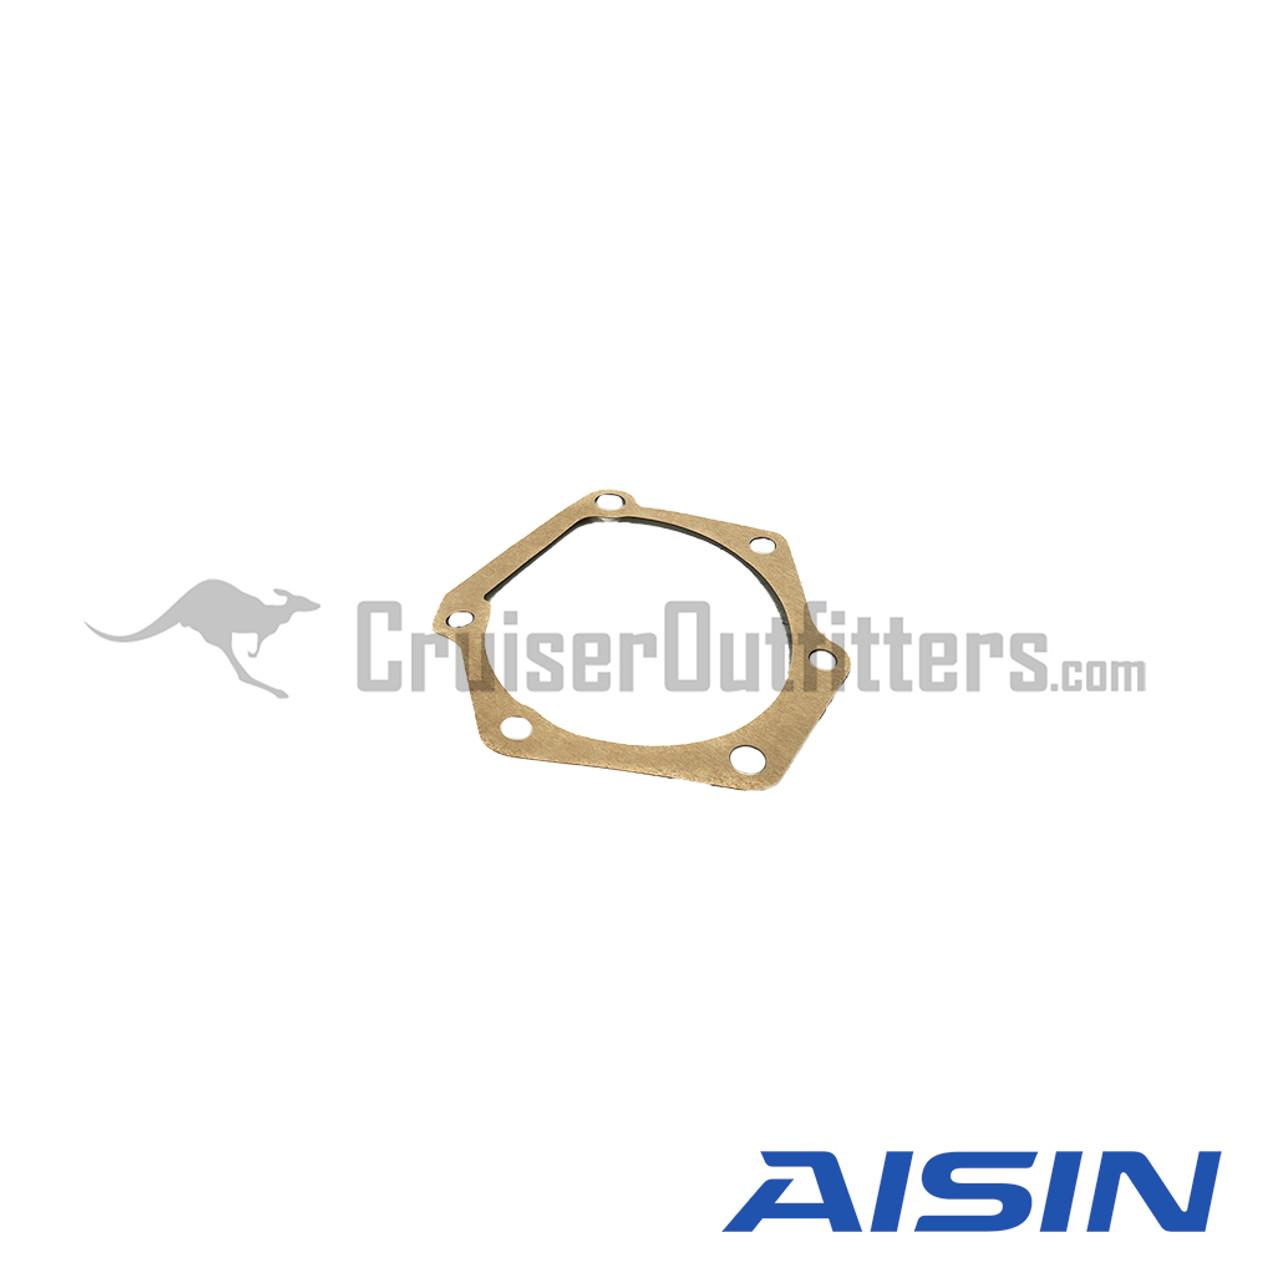 Water Pump - AISIN - Fits 4/1990+ LJ7x w/ 2L/2LTE/3L/5LE (Check Vin) (EGW59155)